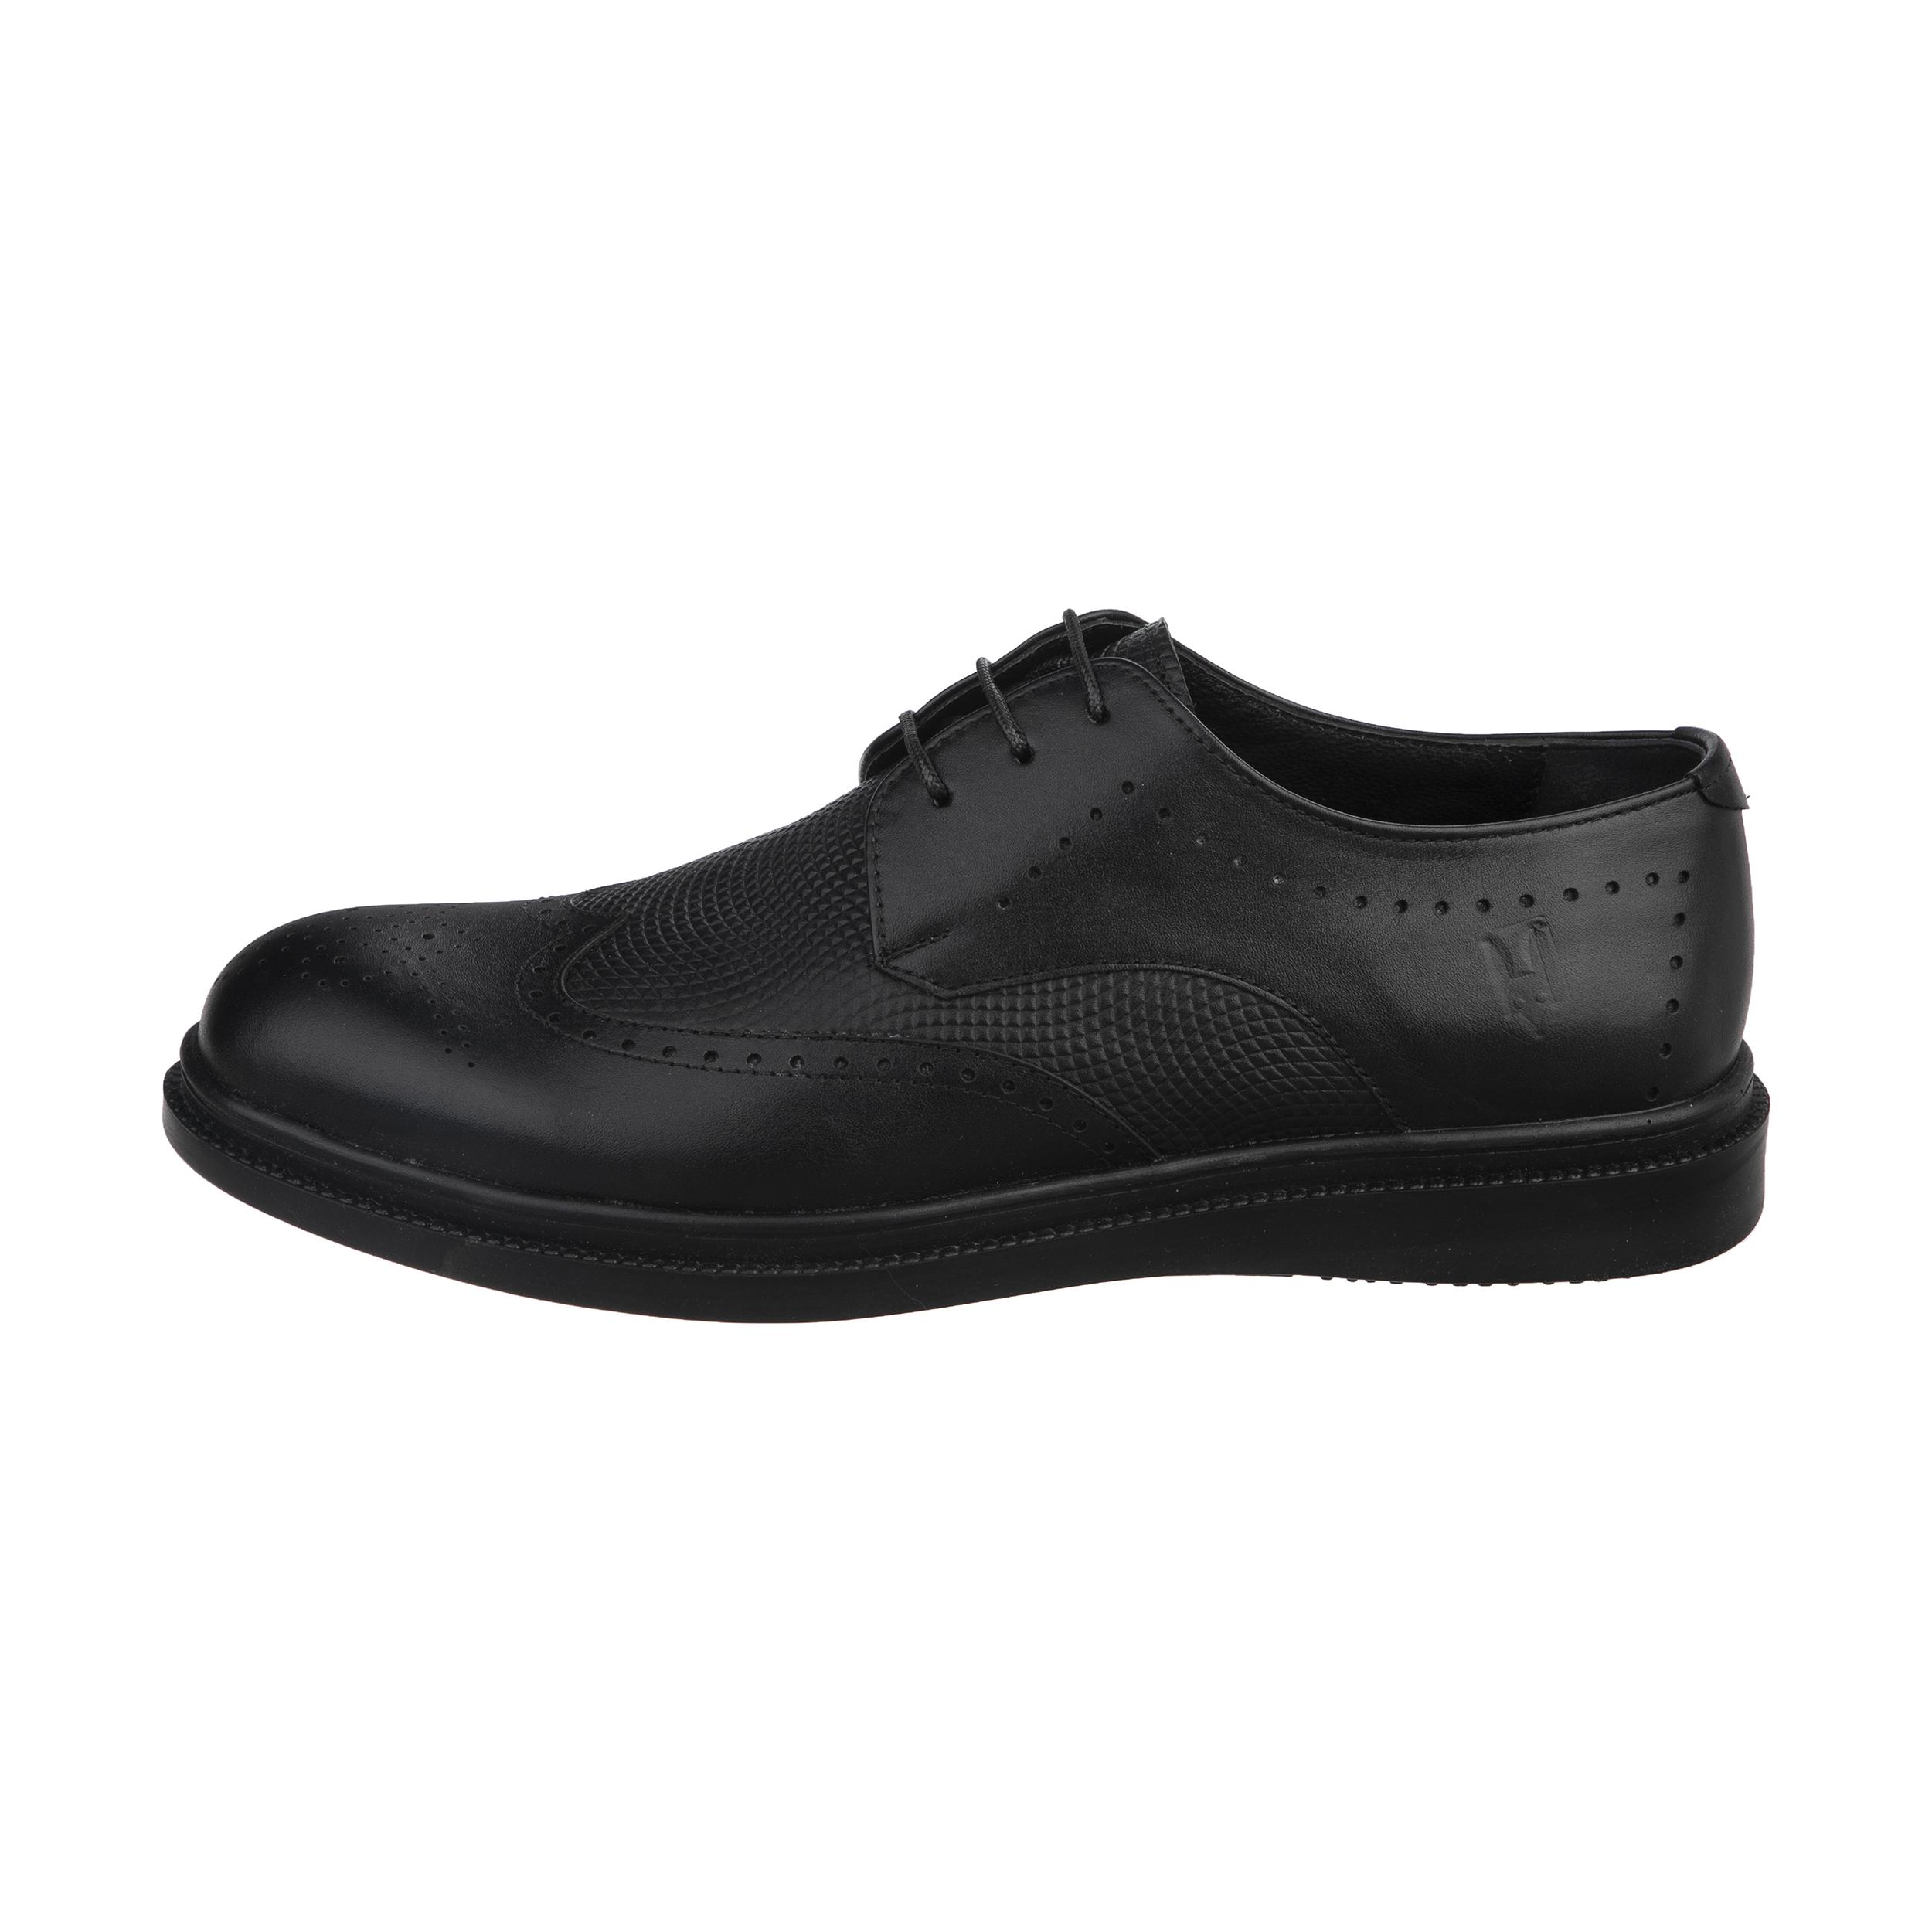 کفش روزمره مردانه مل اند موژ کد MCL312-1